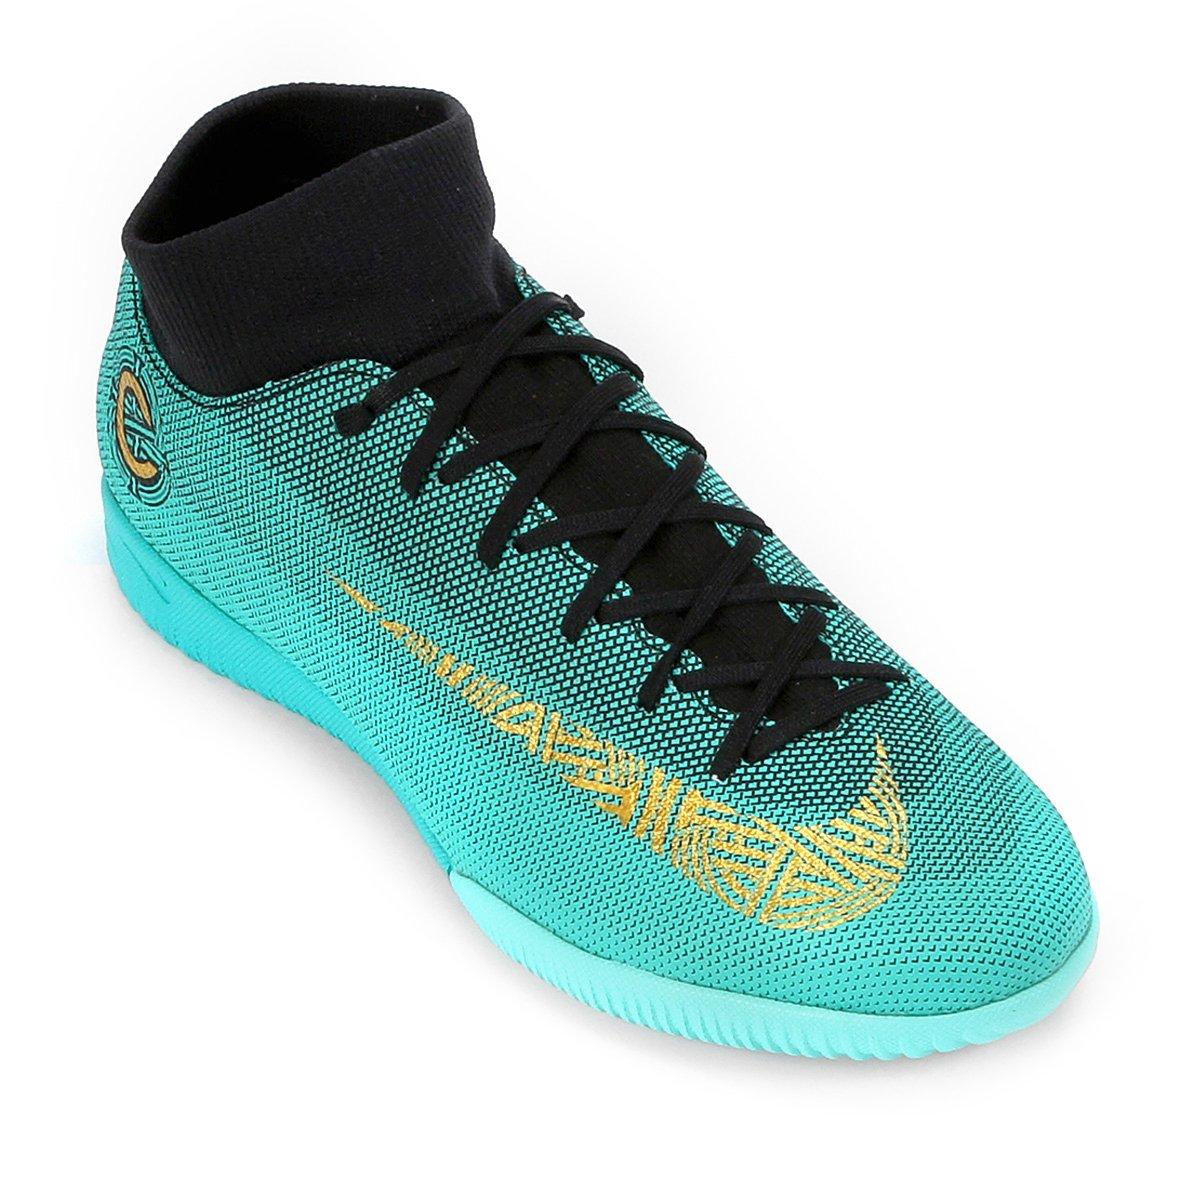 Superfly Chuteira IC 6 Mercurial Nike Academy Verde Masculina Futsal água CR7 tnxqr0t